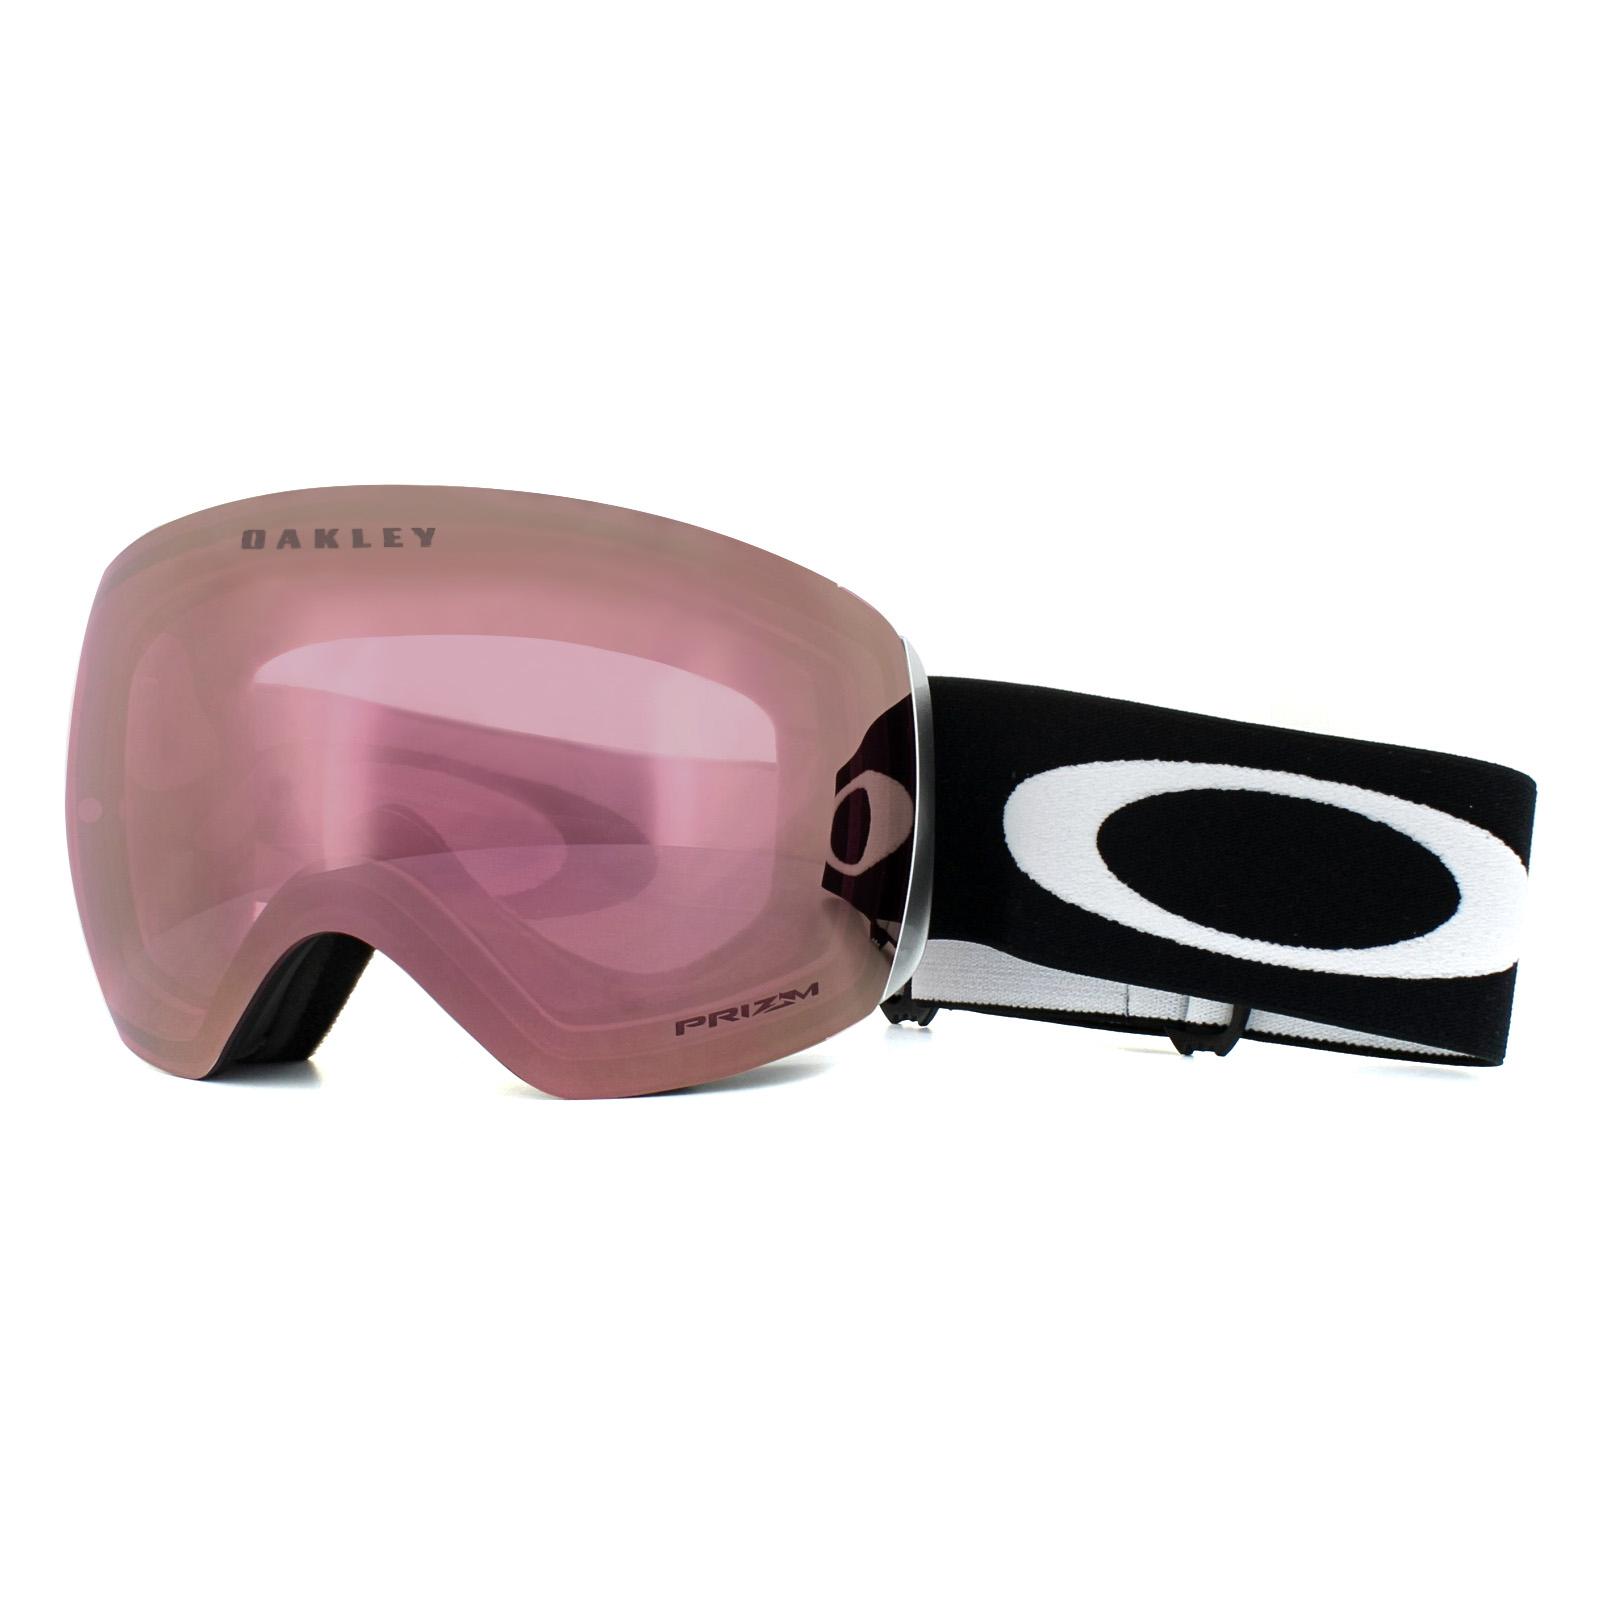 ff58157cdbae Oakley Pink Iridium Lense Review « One More Soul